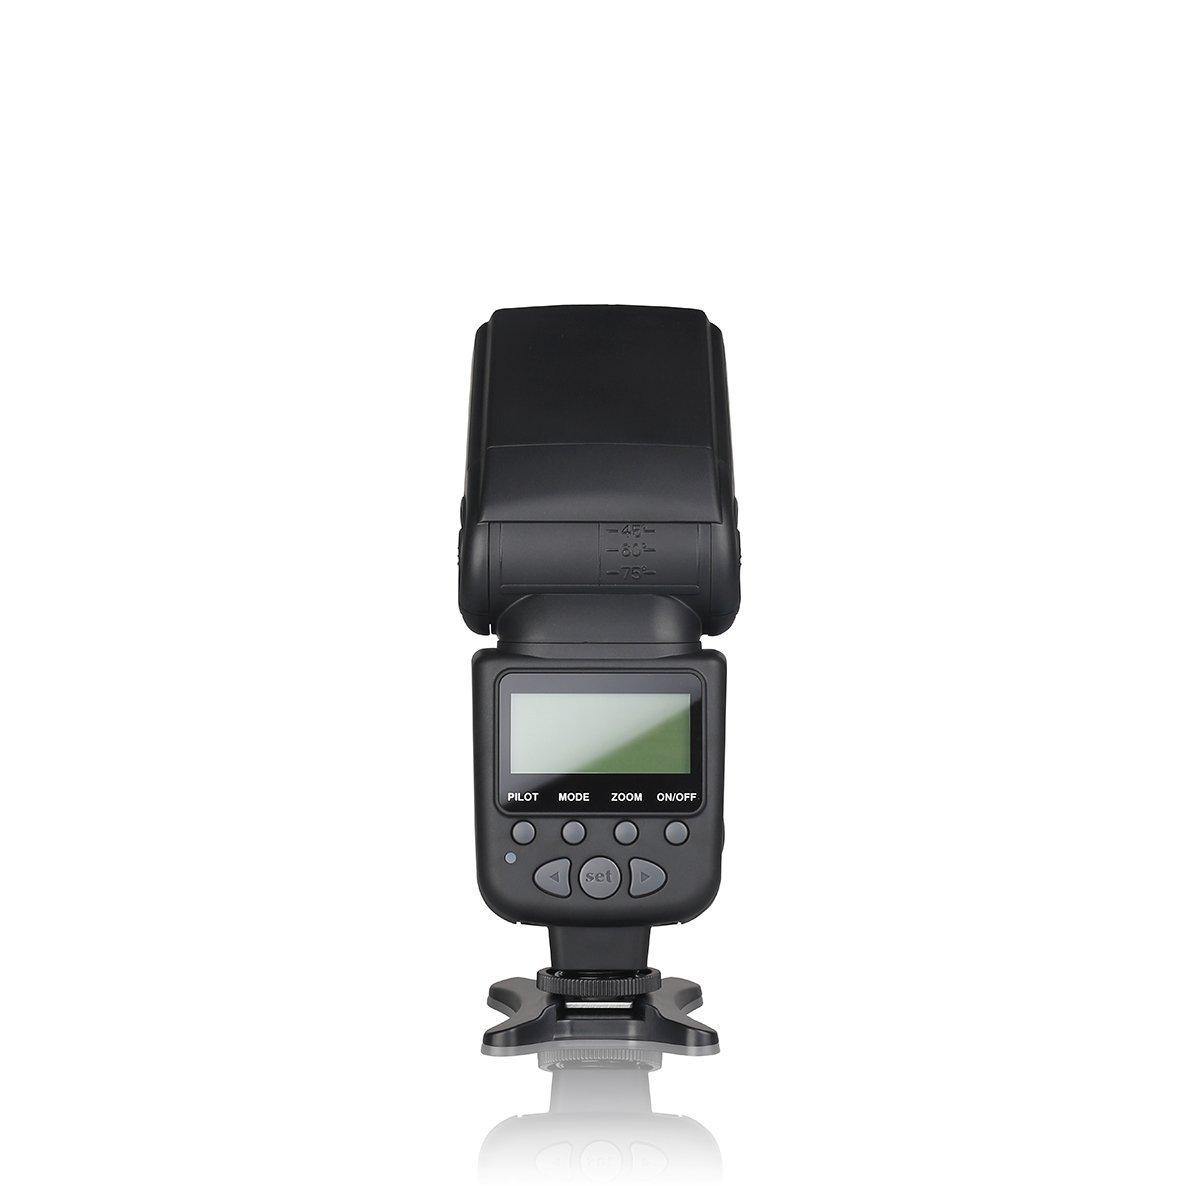 Meike MK-950CTTL TTL Flash speedlite camera flash For Canon EOS 5D Mark II 7D 40D 50D 60D